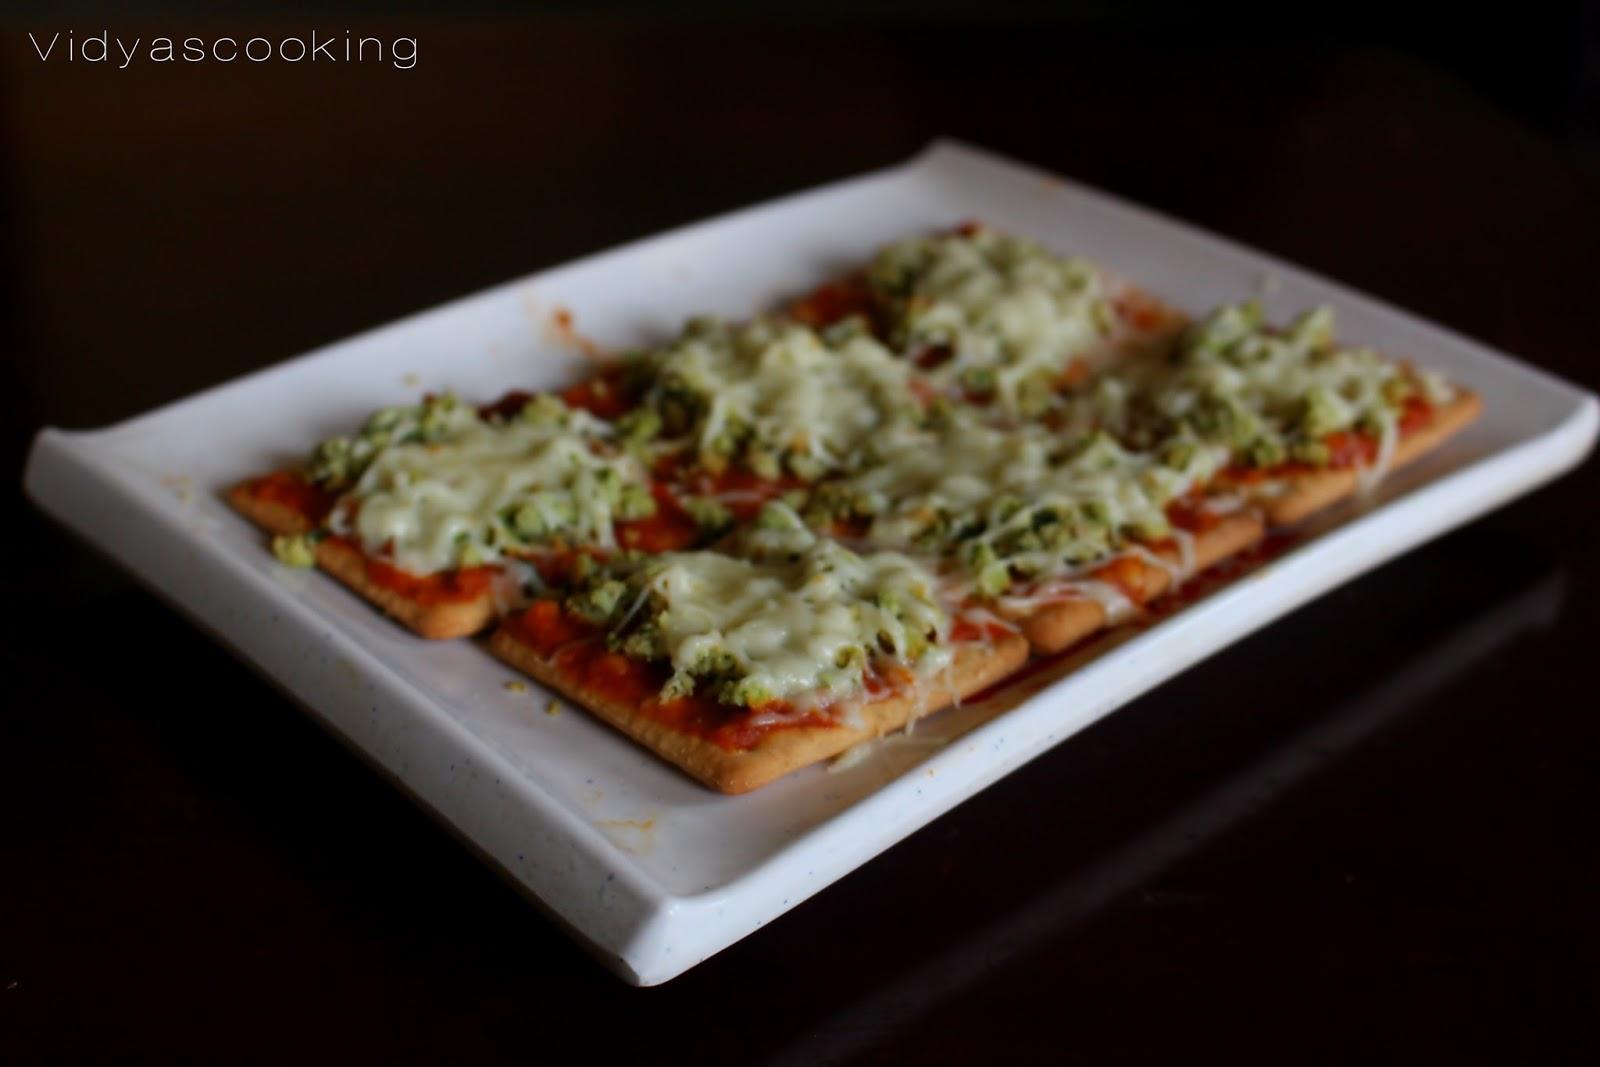 Vidyascooking: Thai Basil Chicken Pizza Crackers Recipe